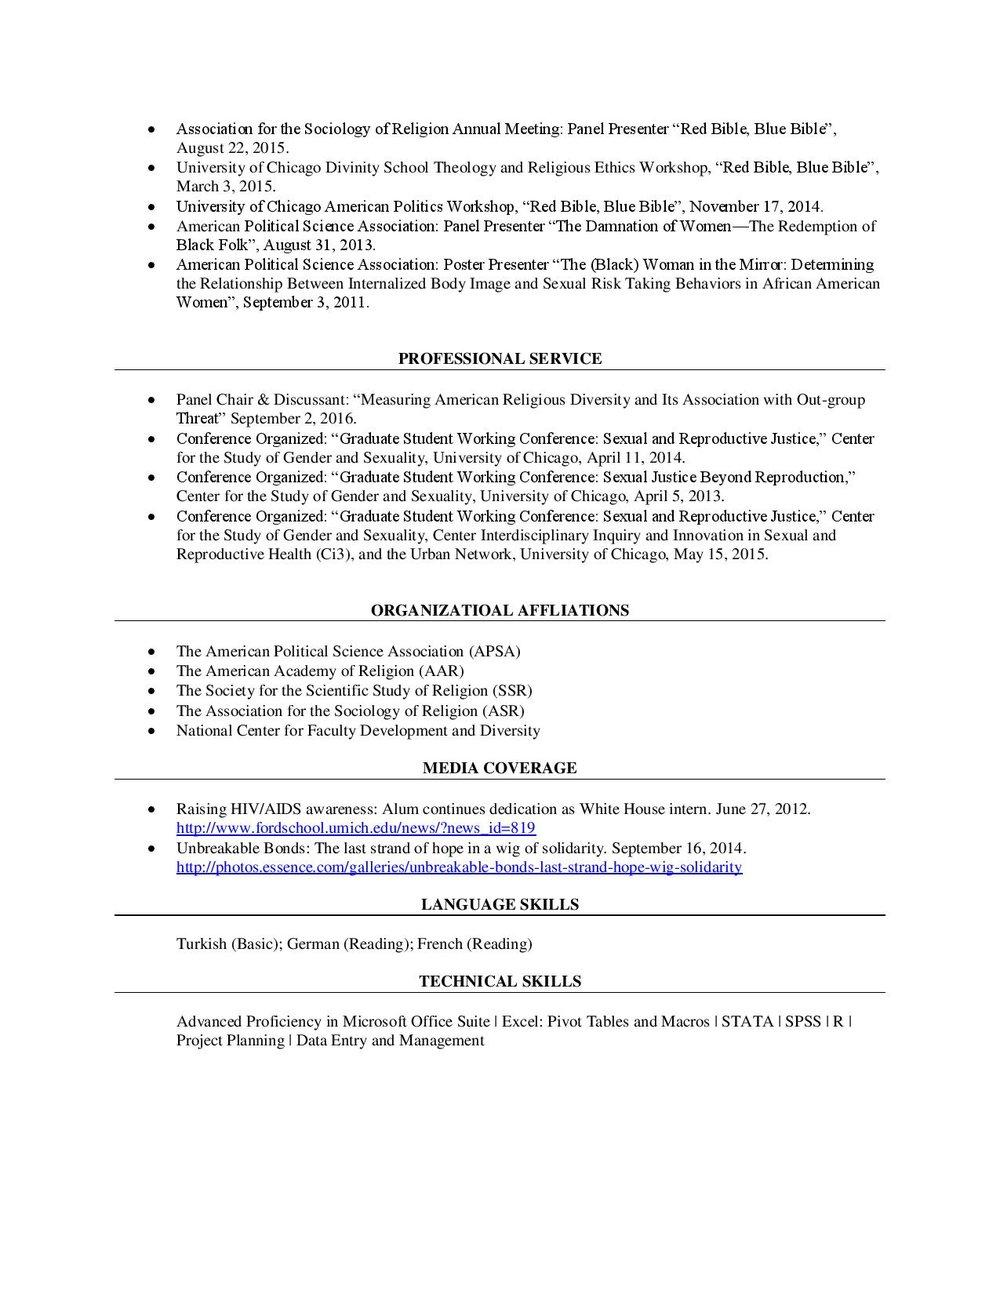 DKU CV public-page-004 (1).jpg